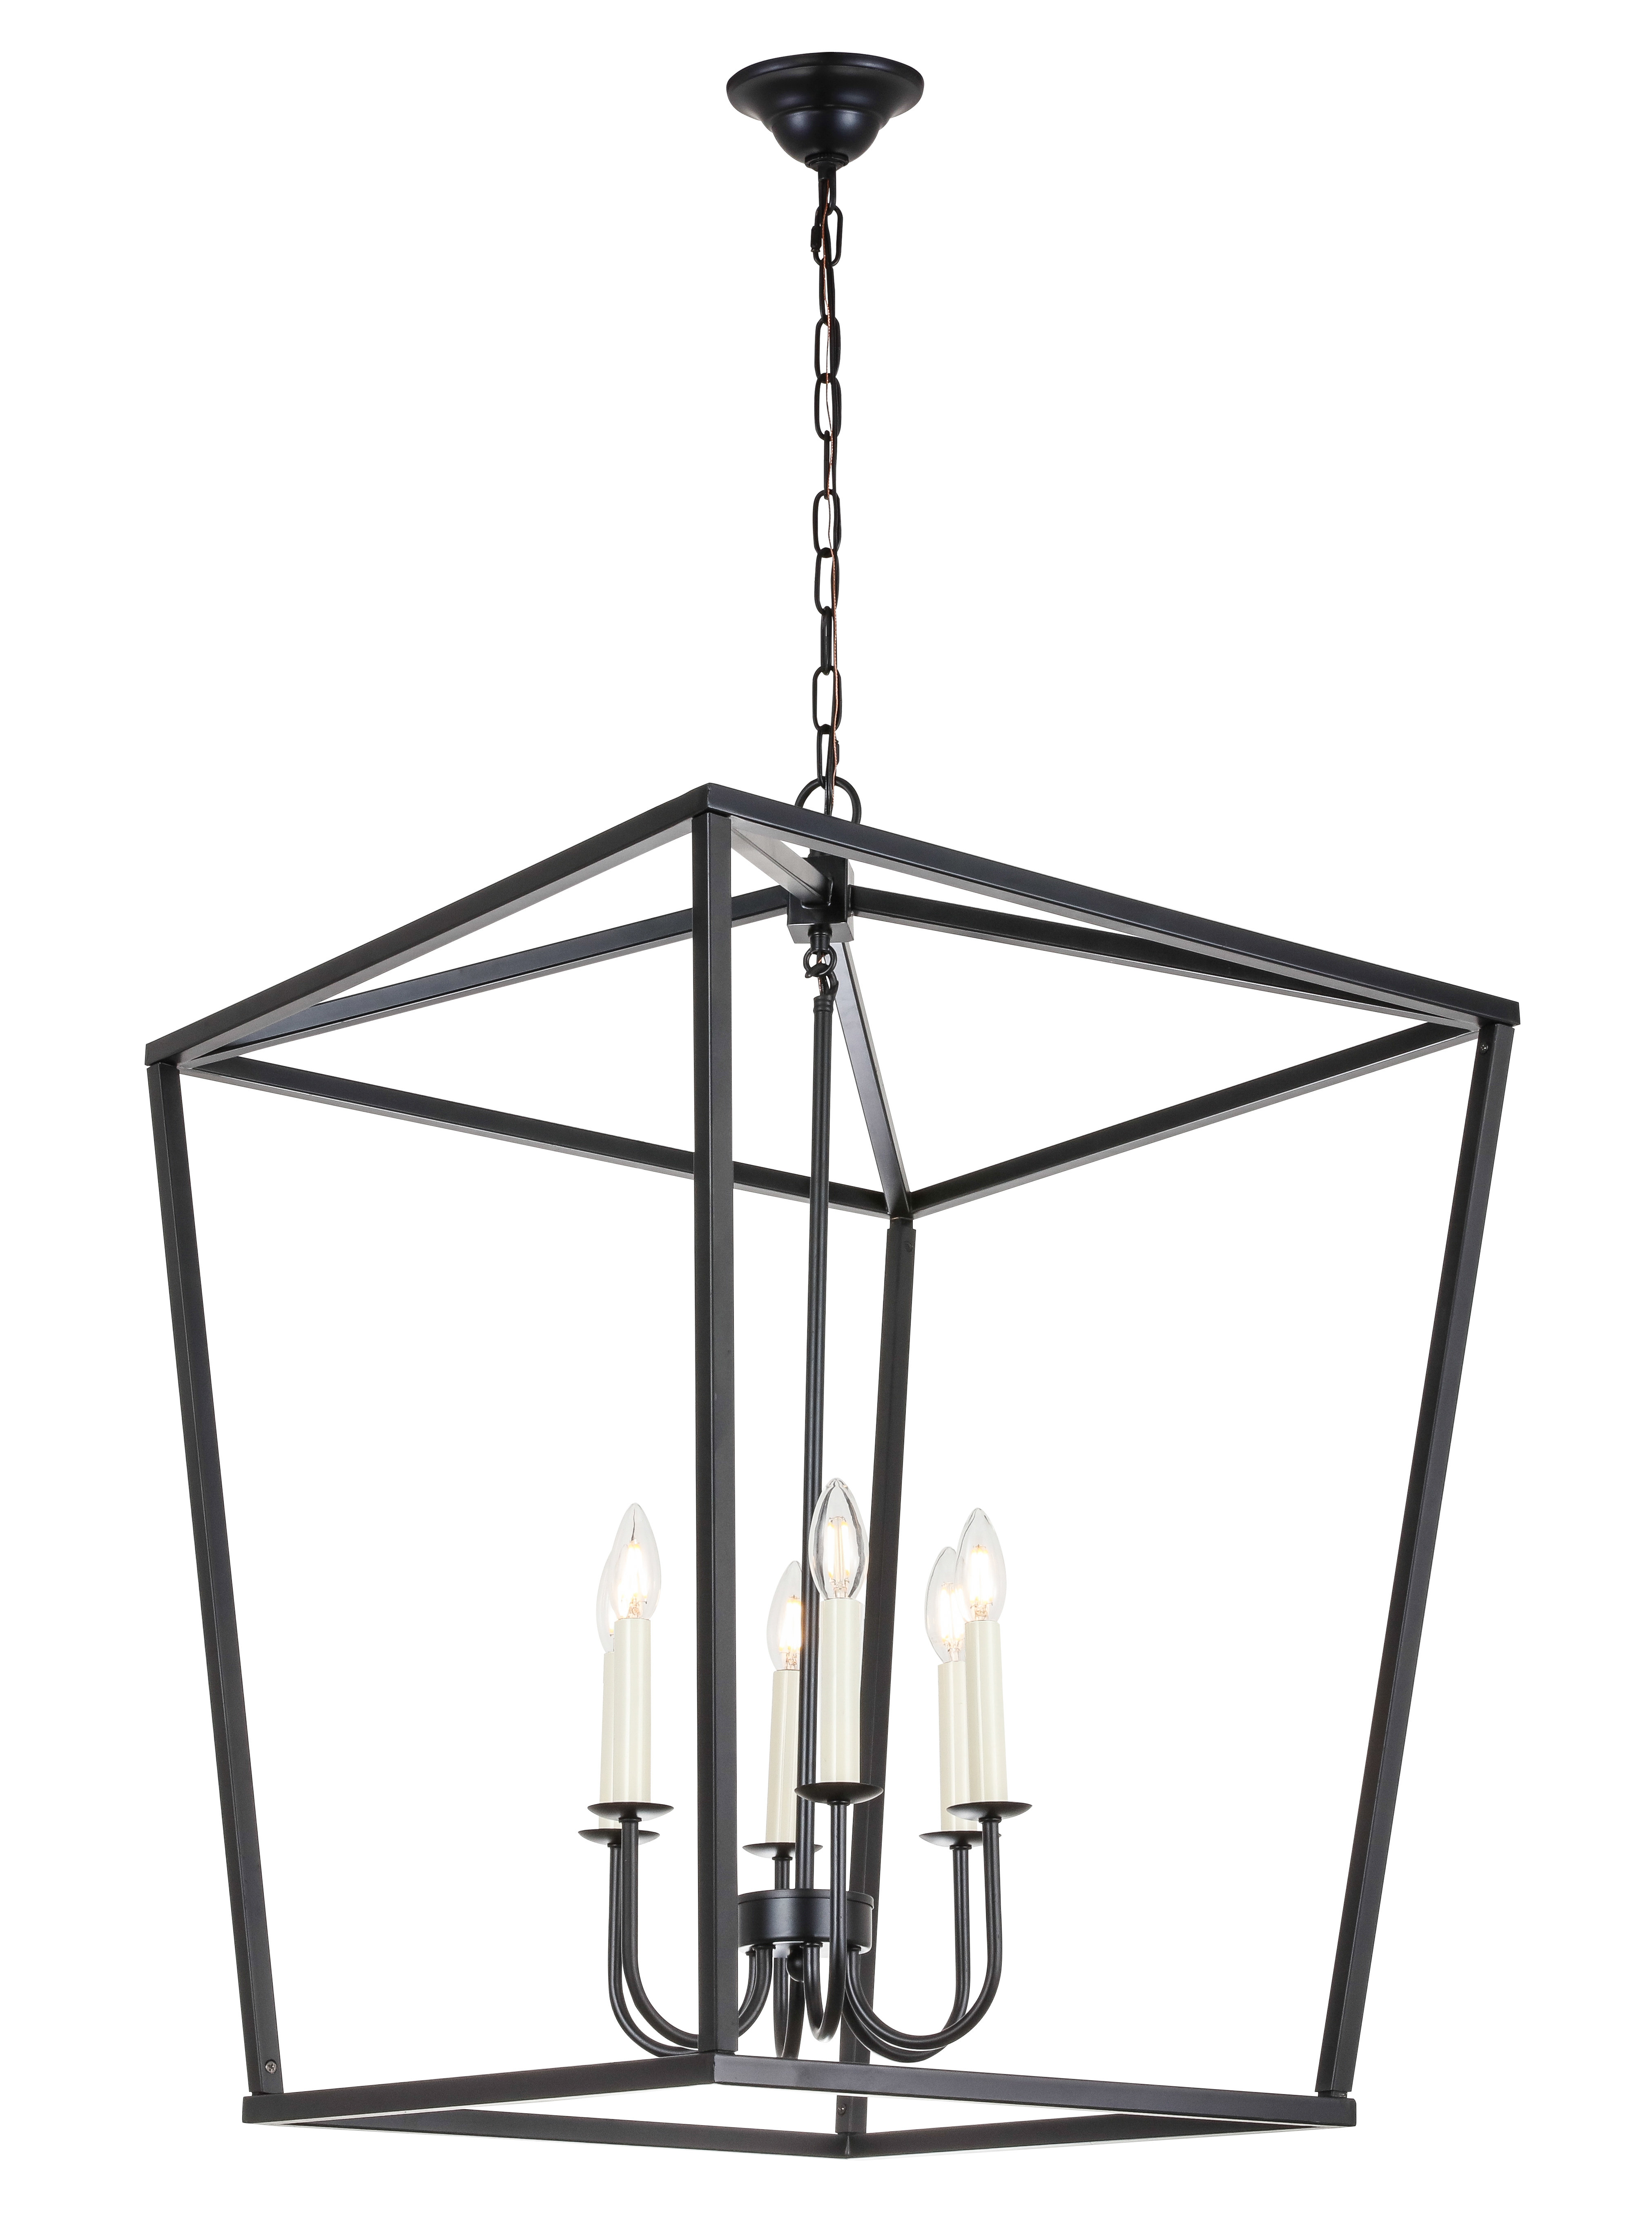 Tanguay 6-Light Lantern Pendant pertaining to Carmen 8-Light Lantern Geometric Pendants (Image 28 of 30)